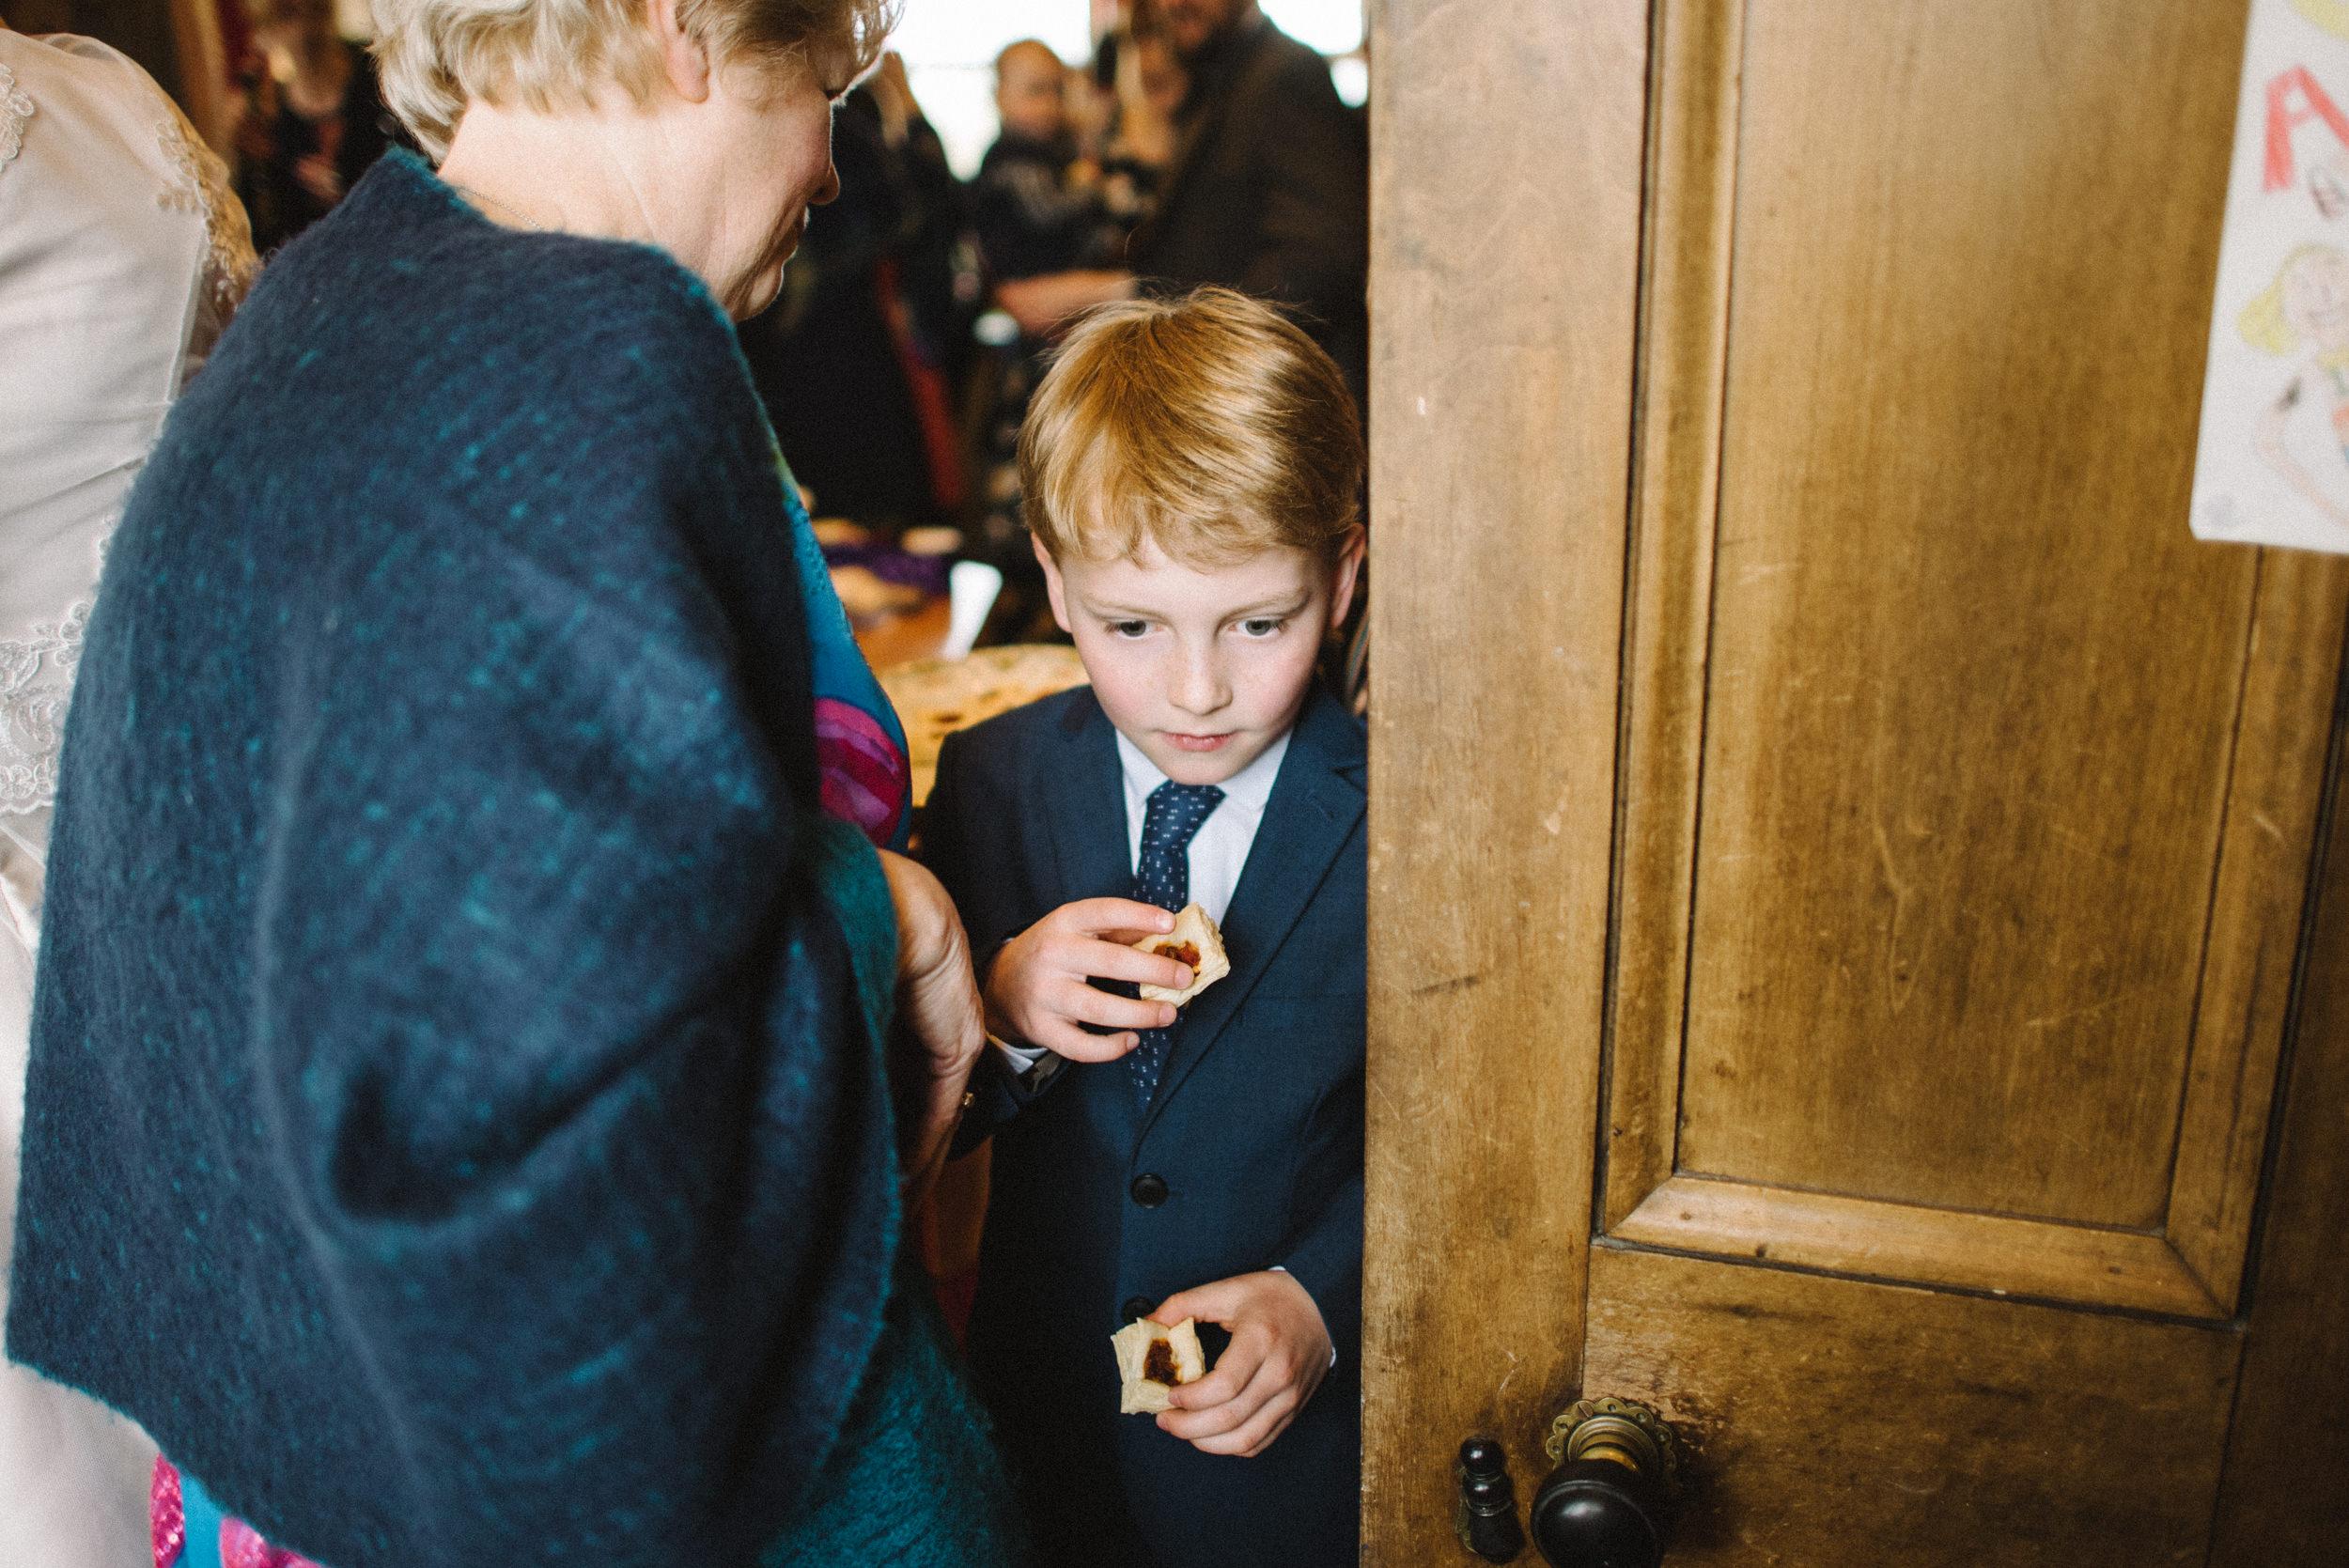 0019-alternative-wedding-portrait-family-kids-photographer-glasgow-scotland.JPG